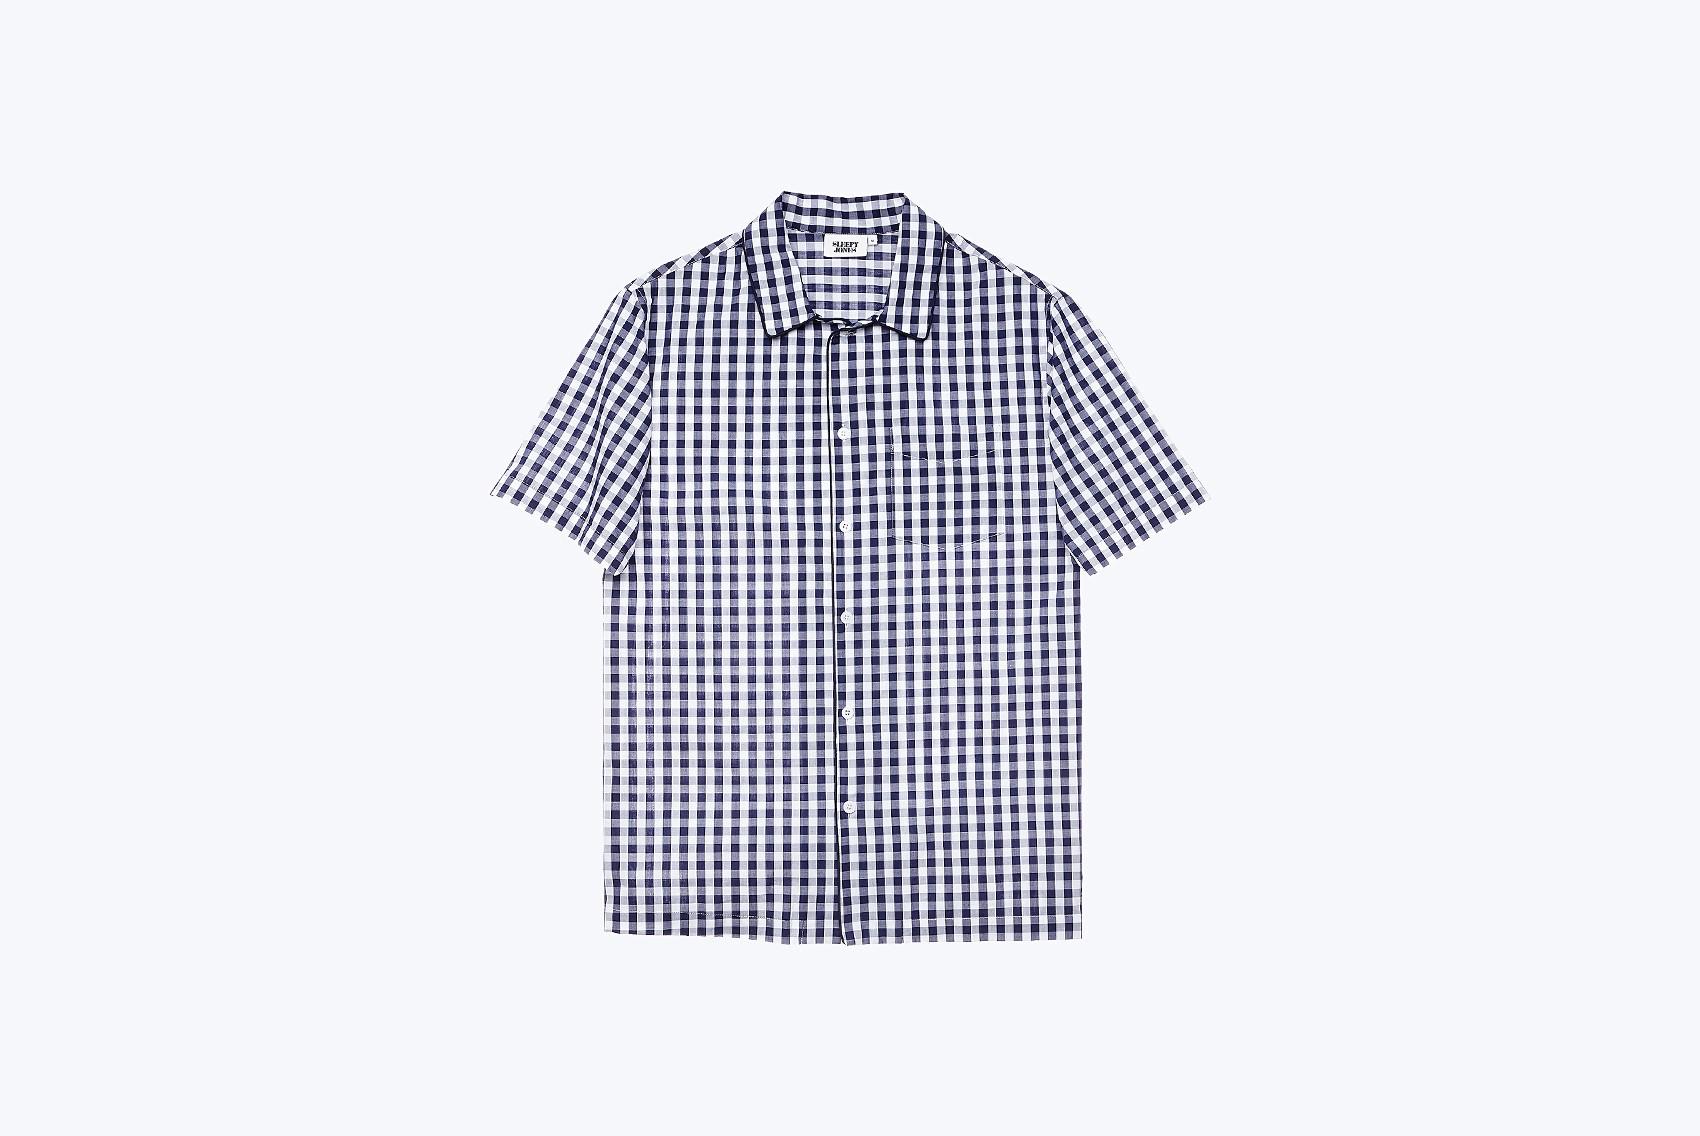 SLEEPY JONES Henry Short Sleeve Pajama Shirt in Large Gingham Navy